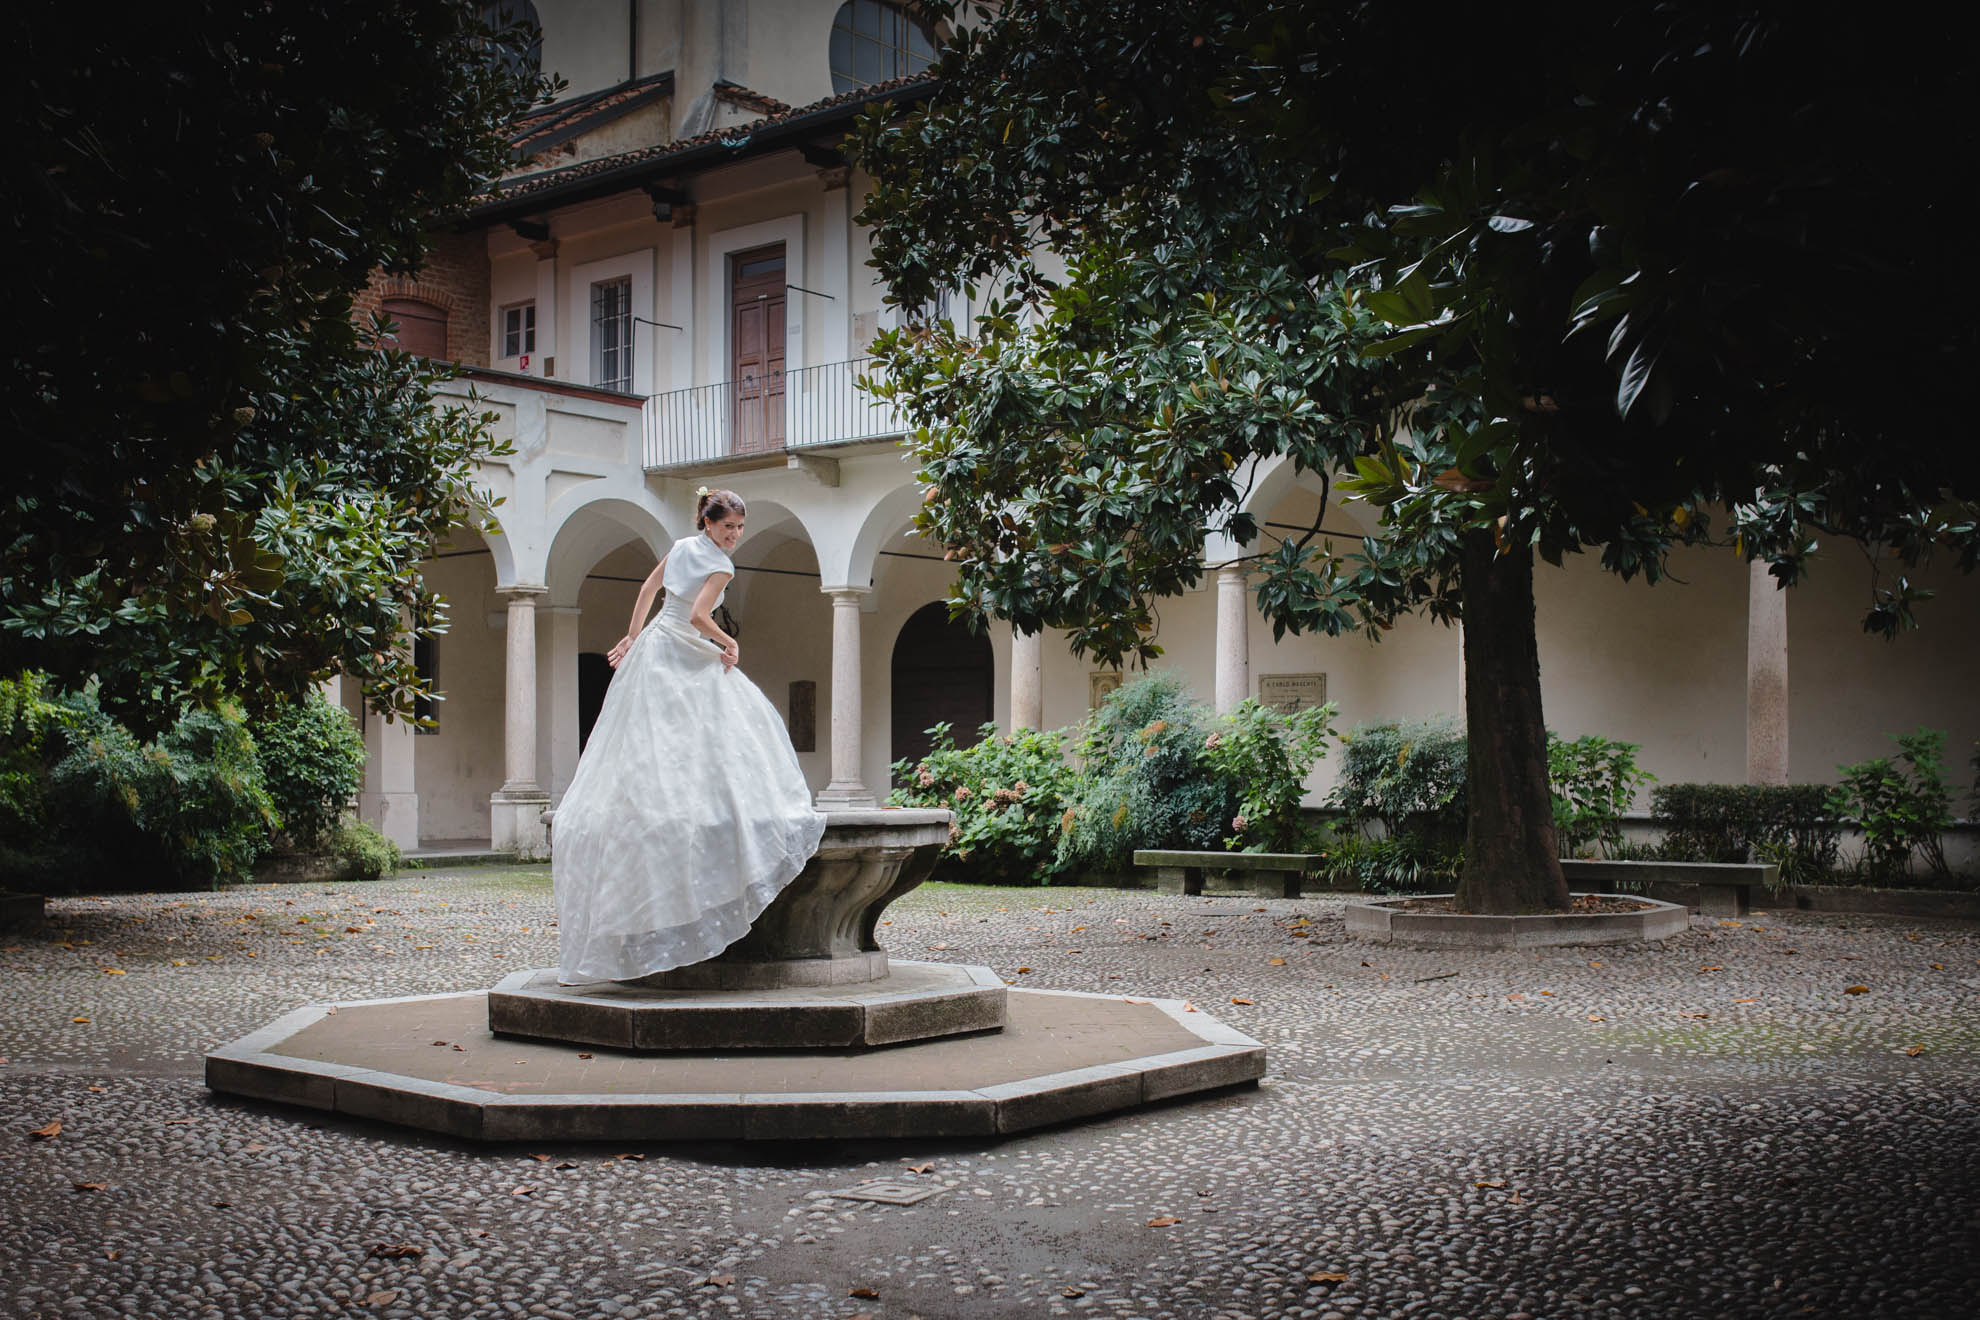 001 Fotografo per Matrimonio Diego Ravenna PaviaIMG_2050